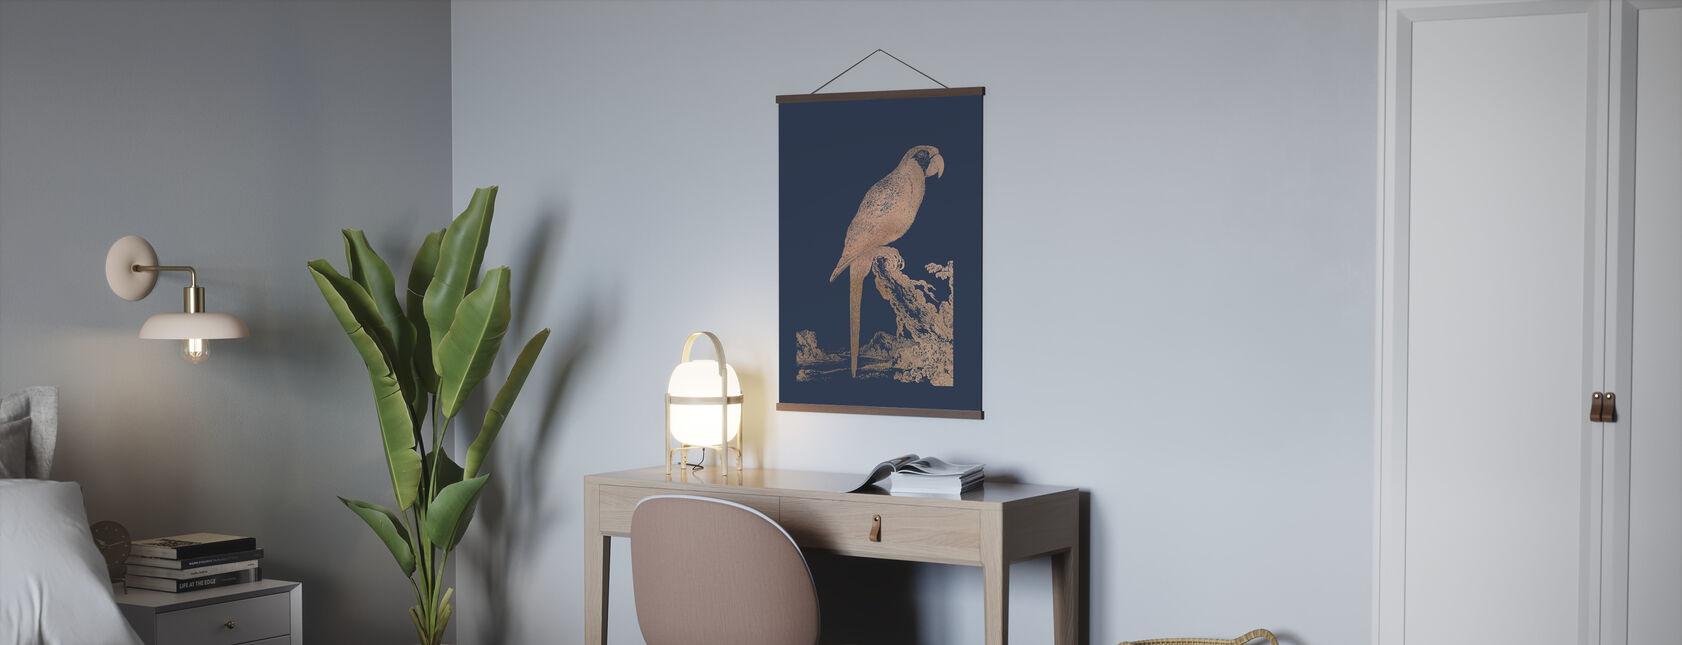 Rose Gold Foil Parrot I on Imperial Blue - Poster - Office